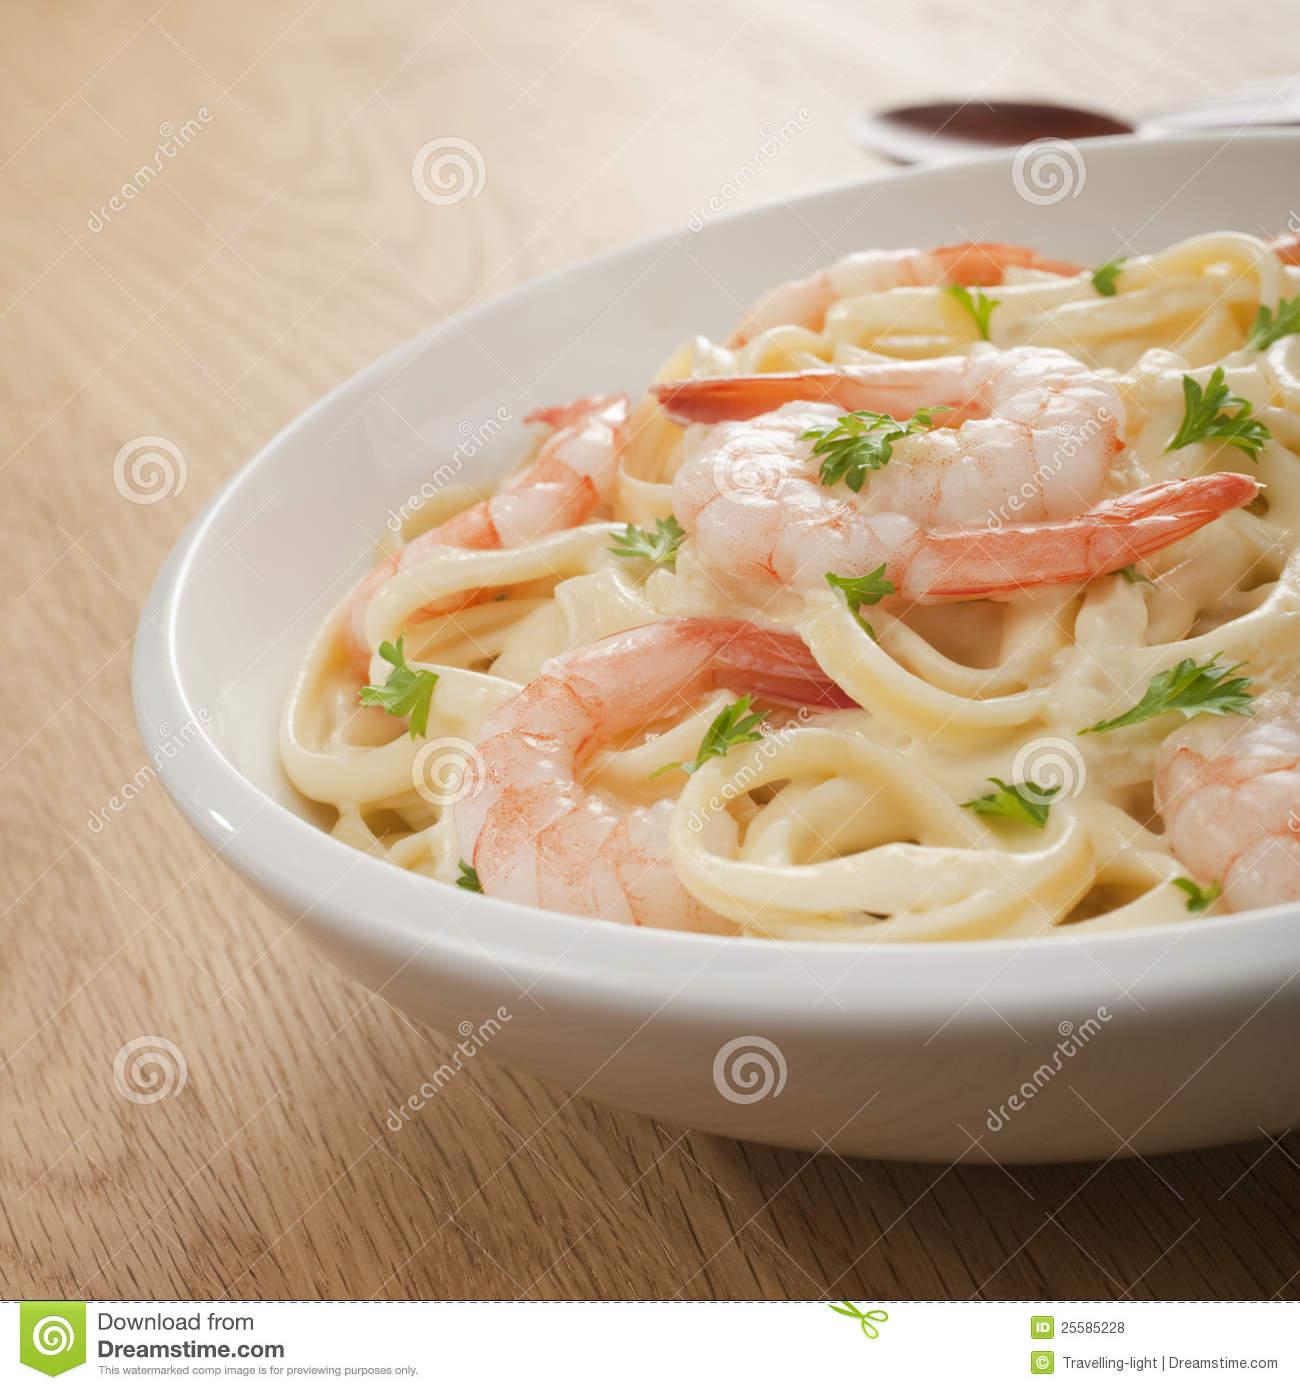 Pasta Fettucine Alfredo With Shrimp Or Prawns Stock Photos.